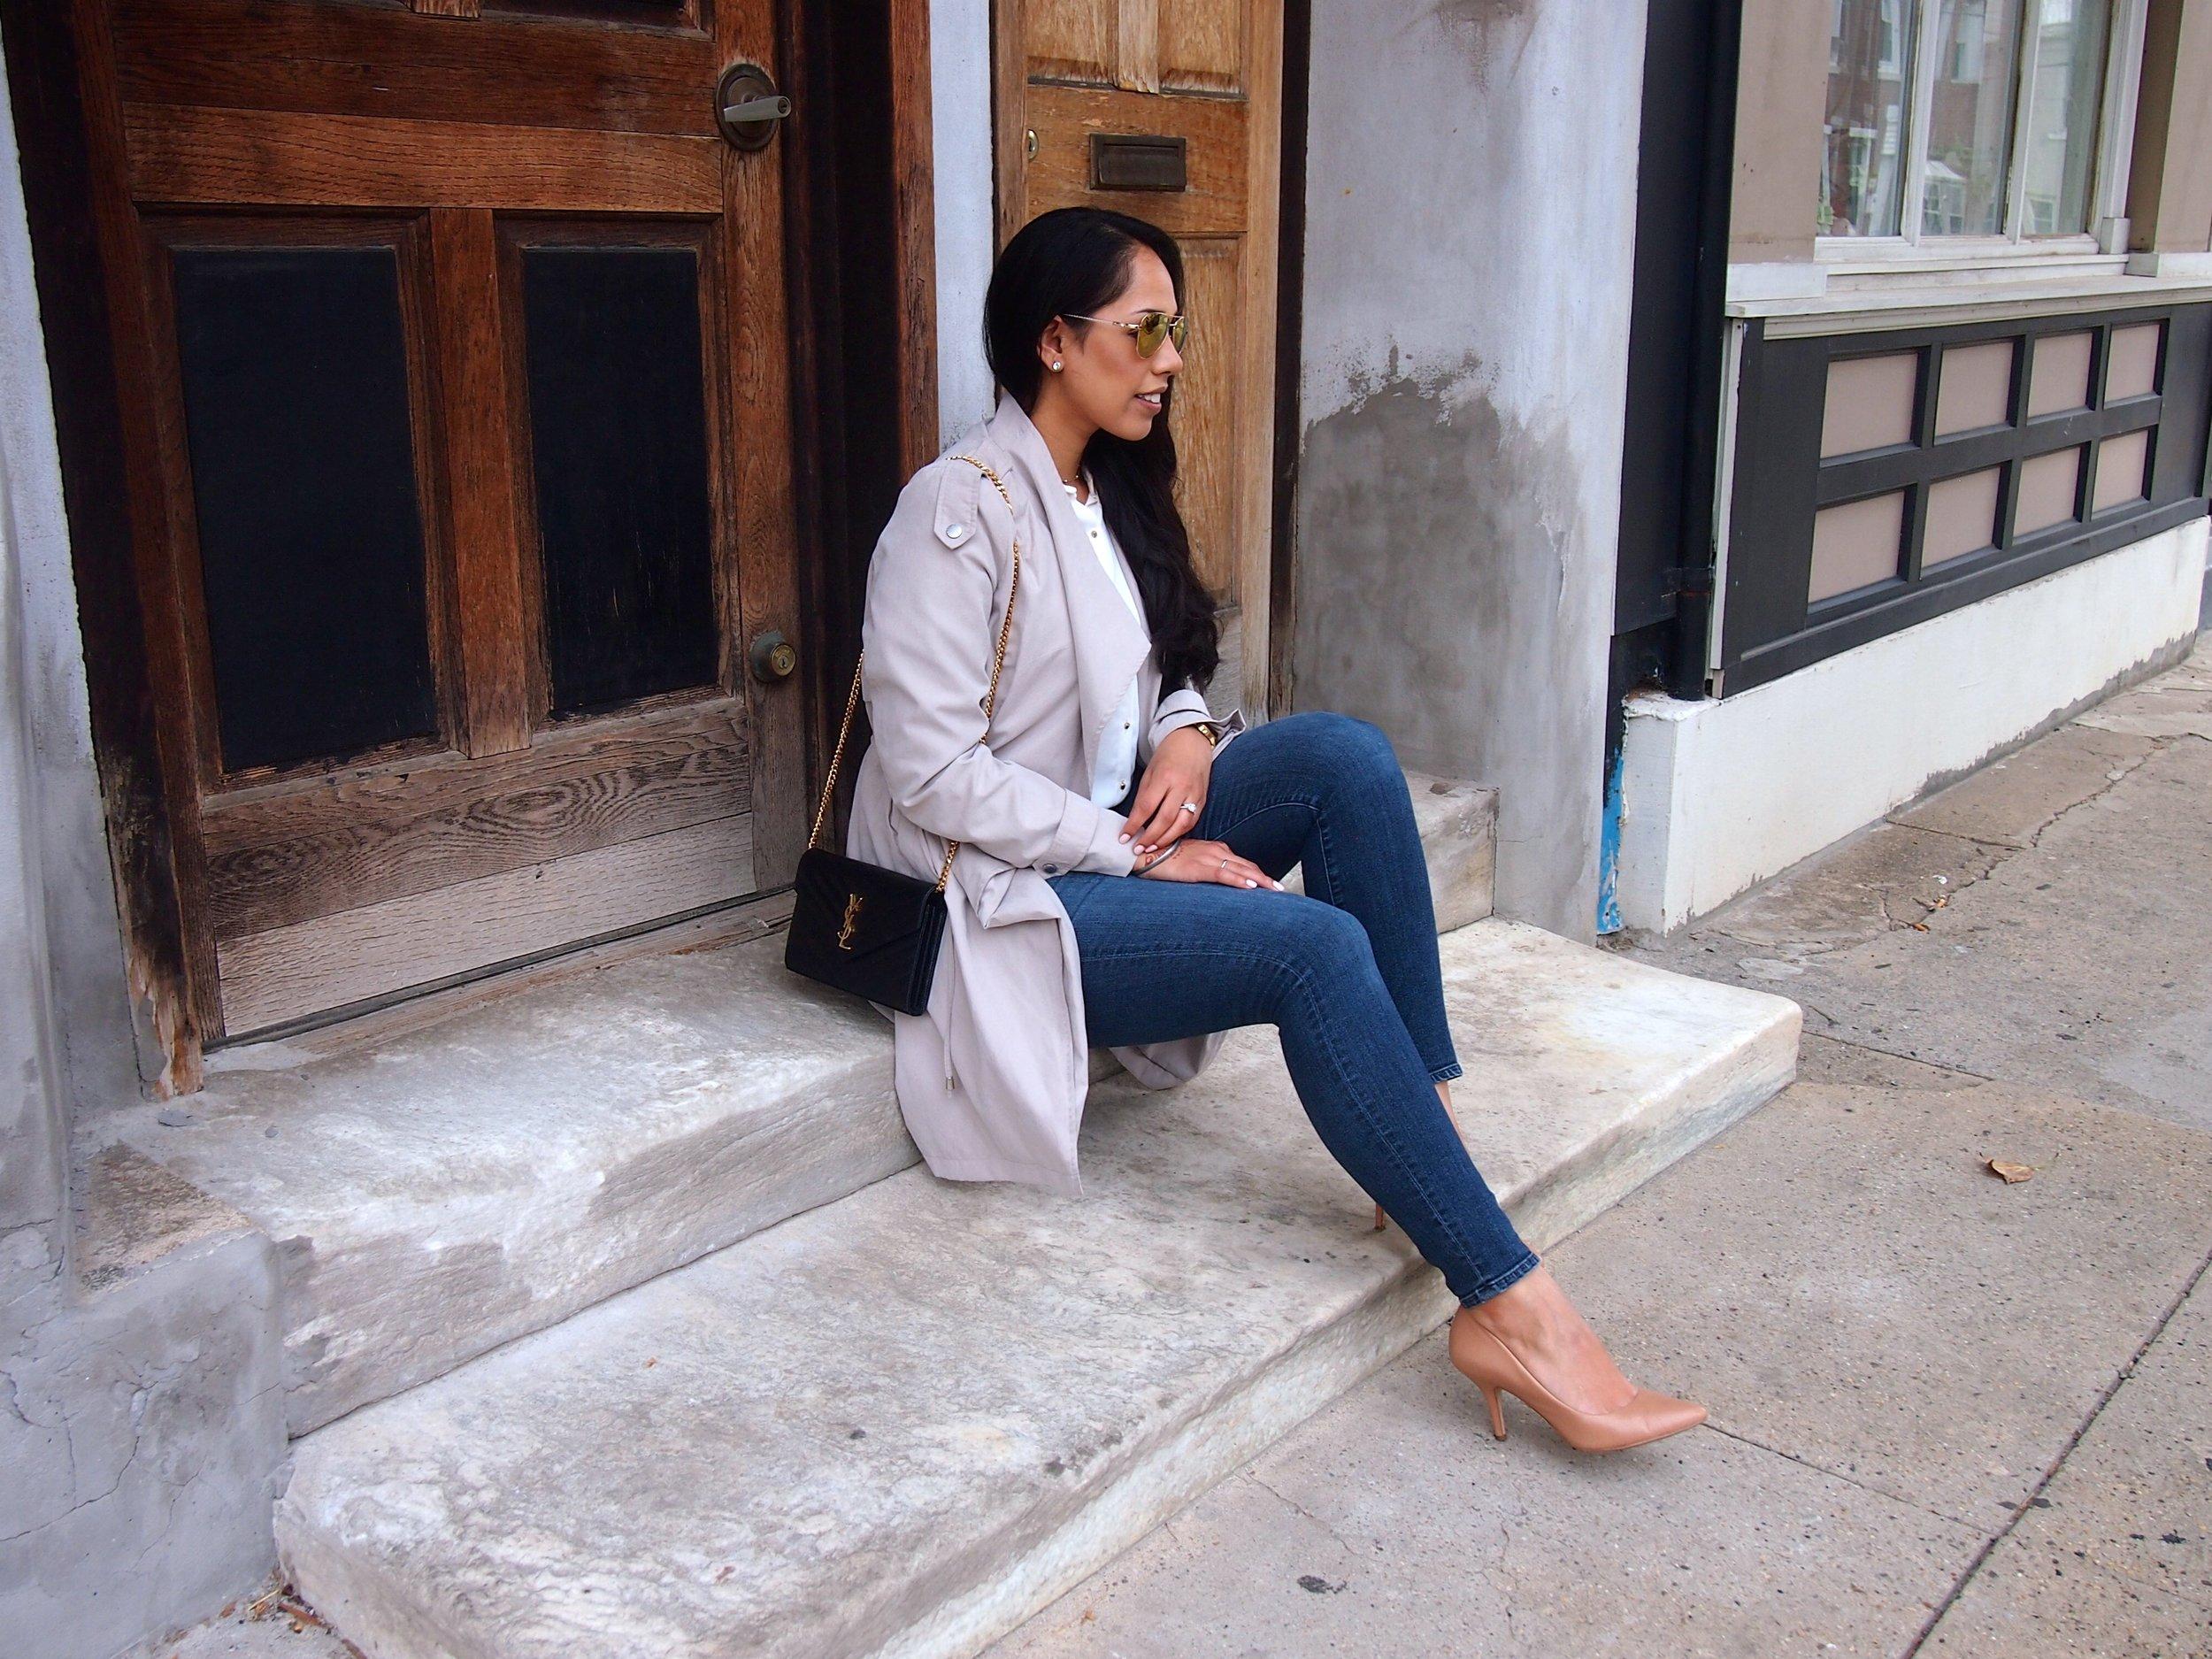 philadelphia-fall-fashion-indian-blogger-mygoldenbeauty.jpg